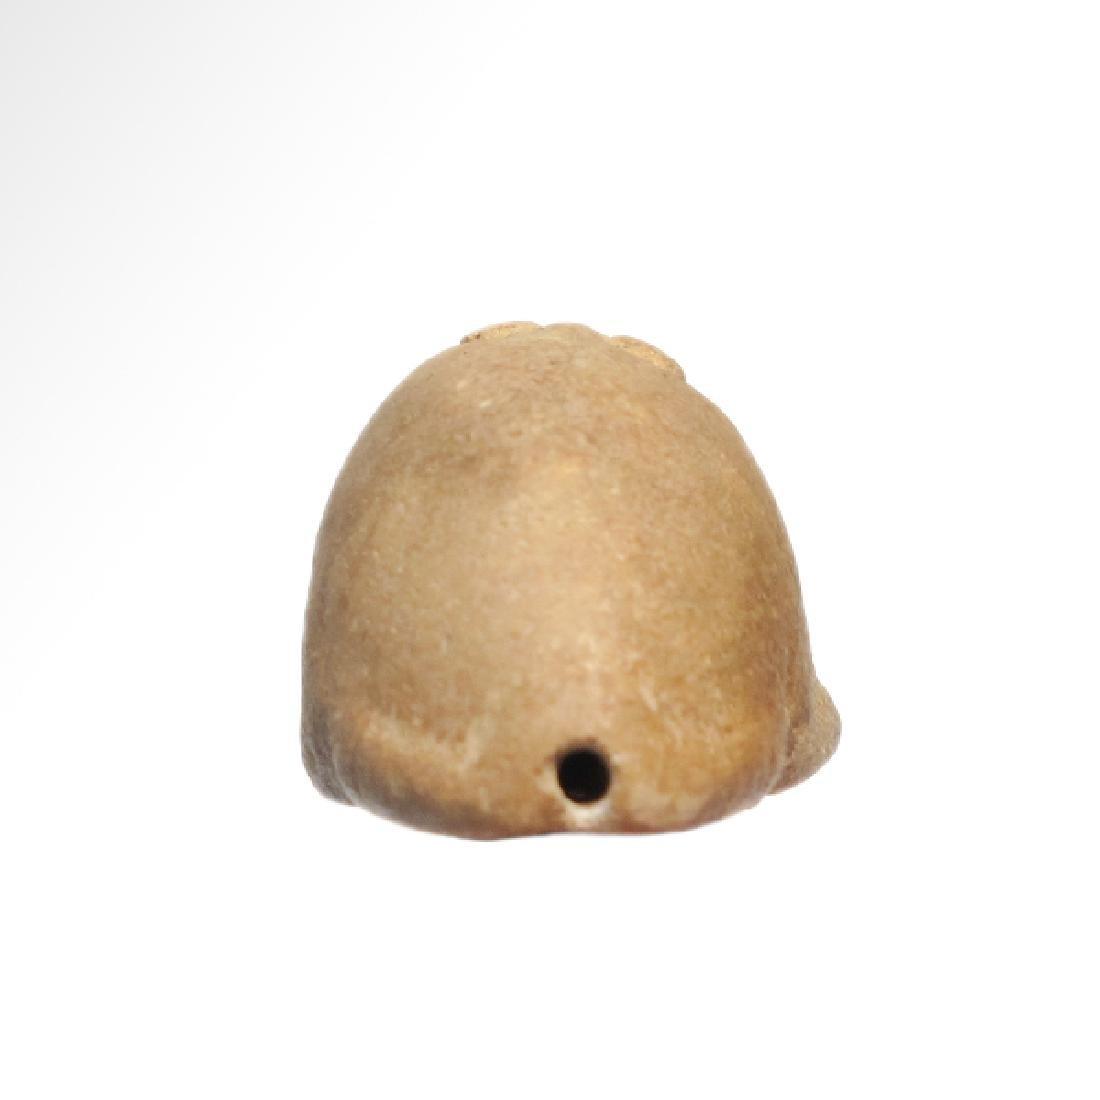 Near Eastern Sumerian White Steatite Frog Amulet, c. - 6